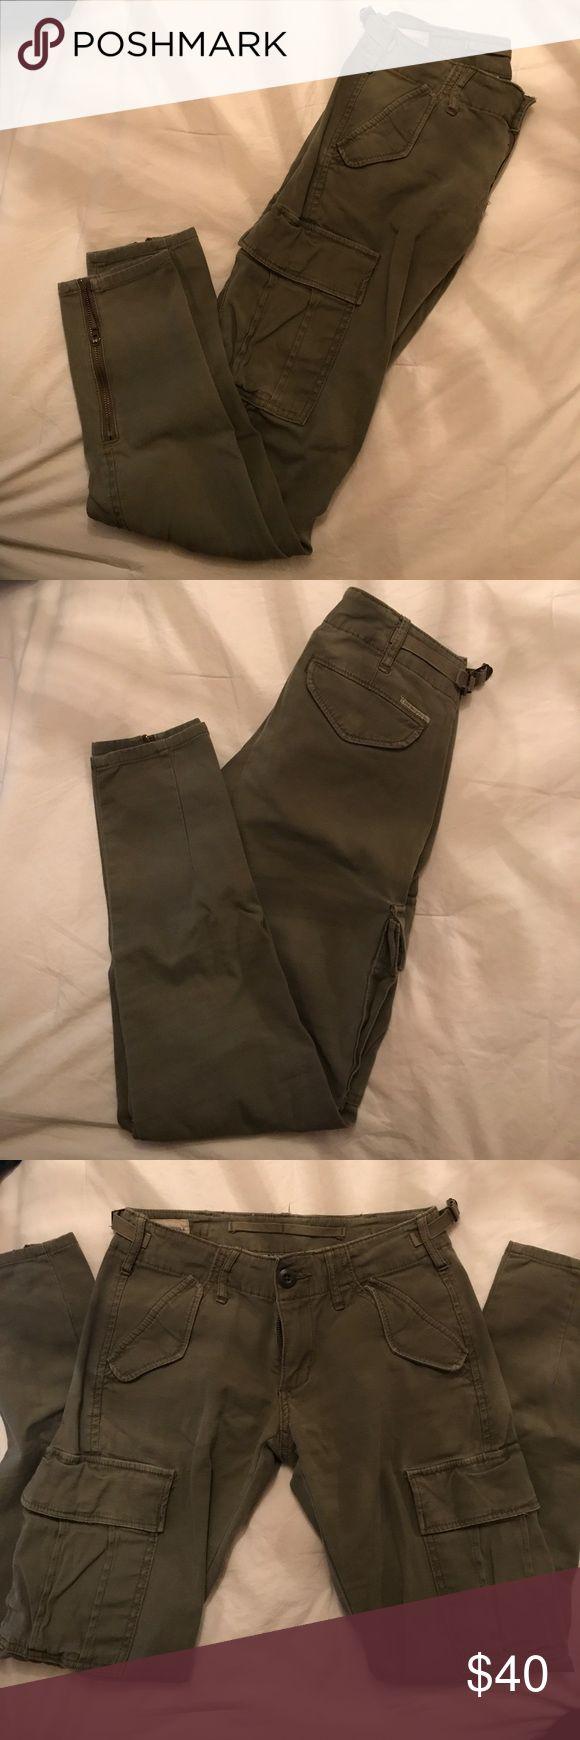 Ralph Lauren Denim Supply Co Cargo Pants Army green cargo pants Denim & Supply Ralph Lauren Pants